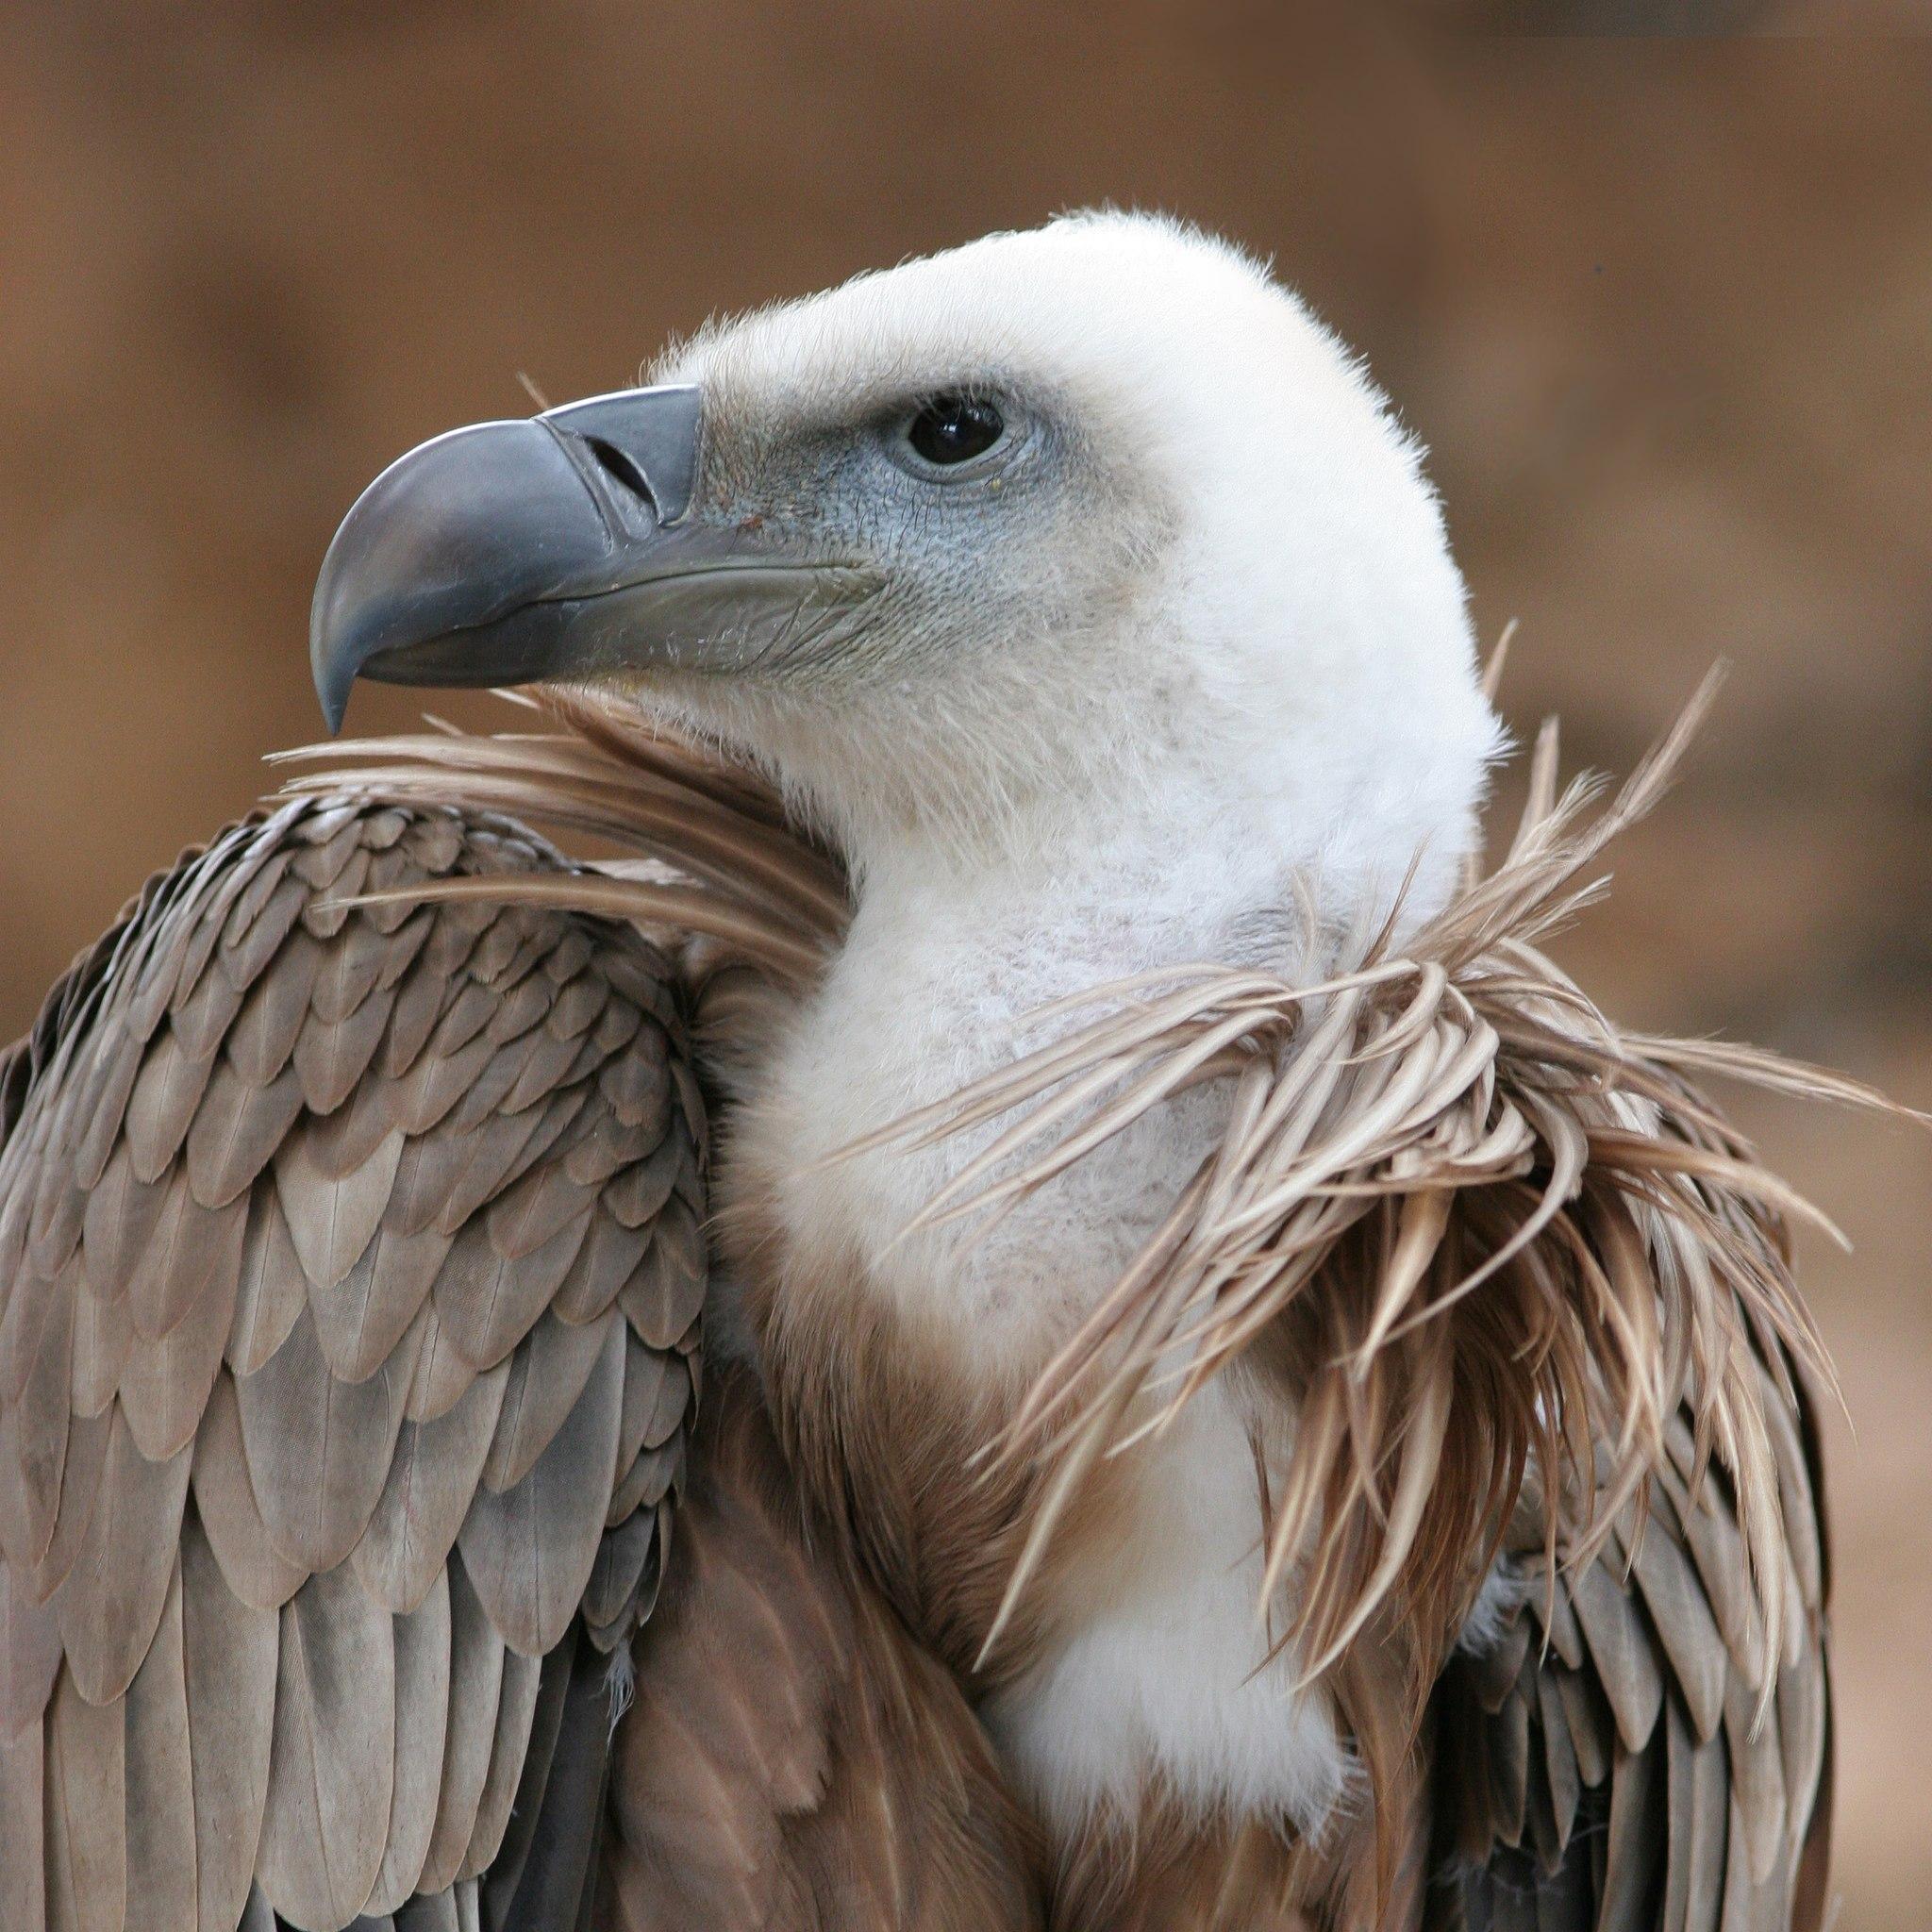 Picture showing a Griffon Vulture (Gyps fulvus) beak.